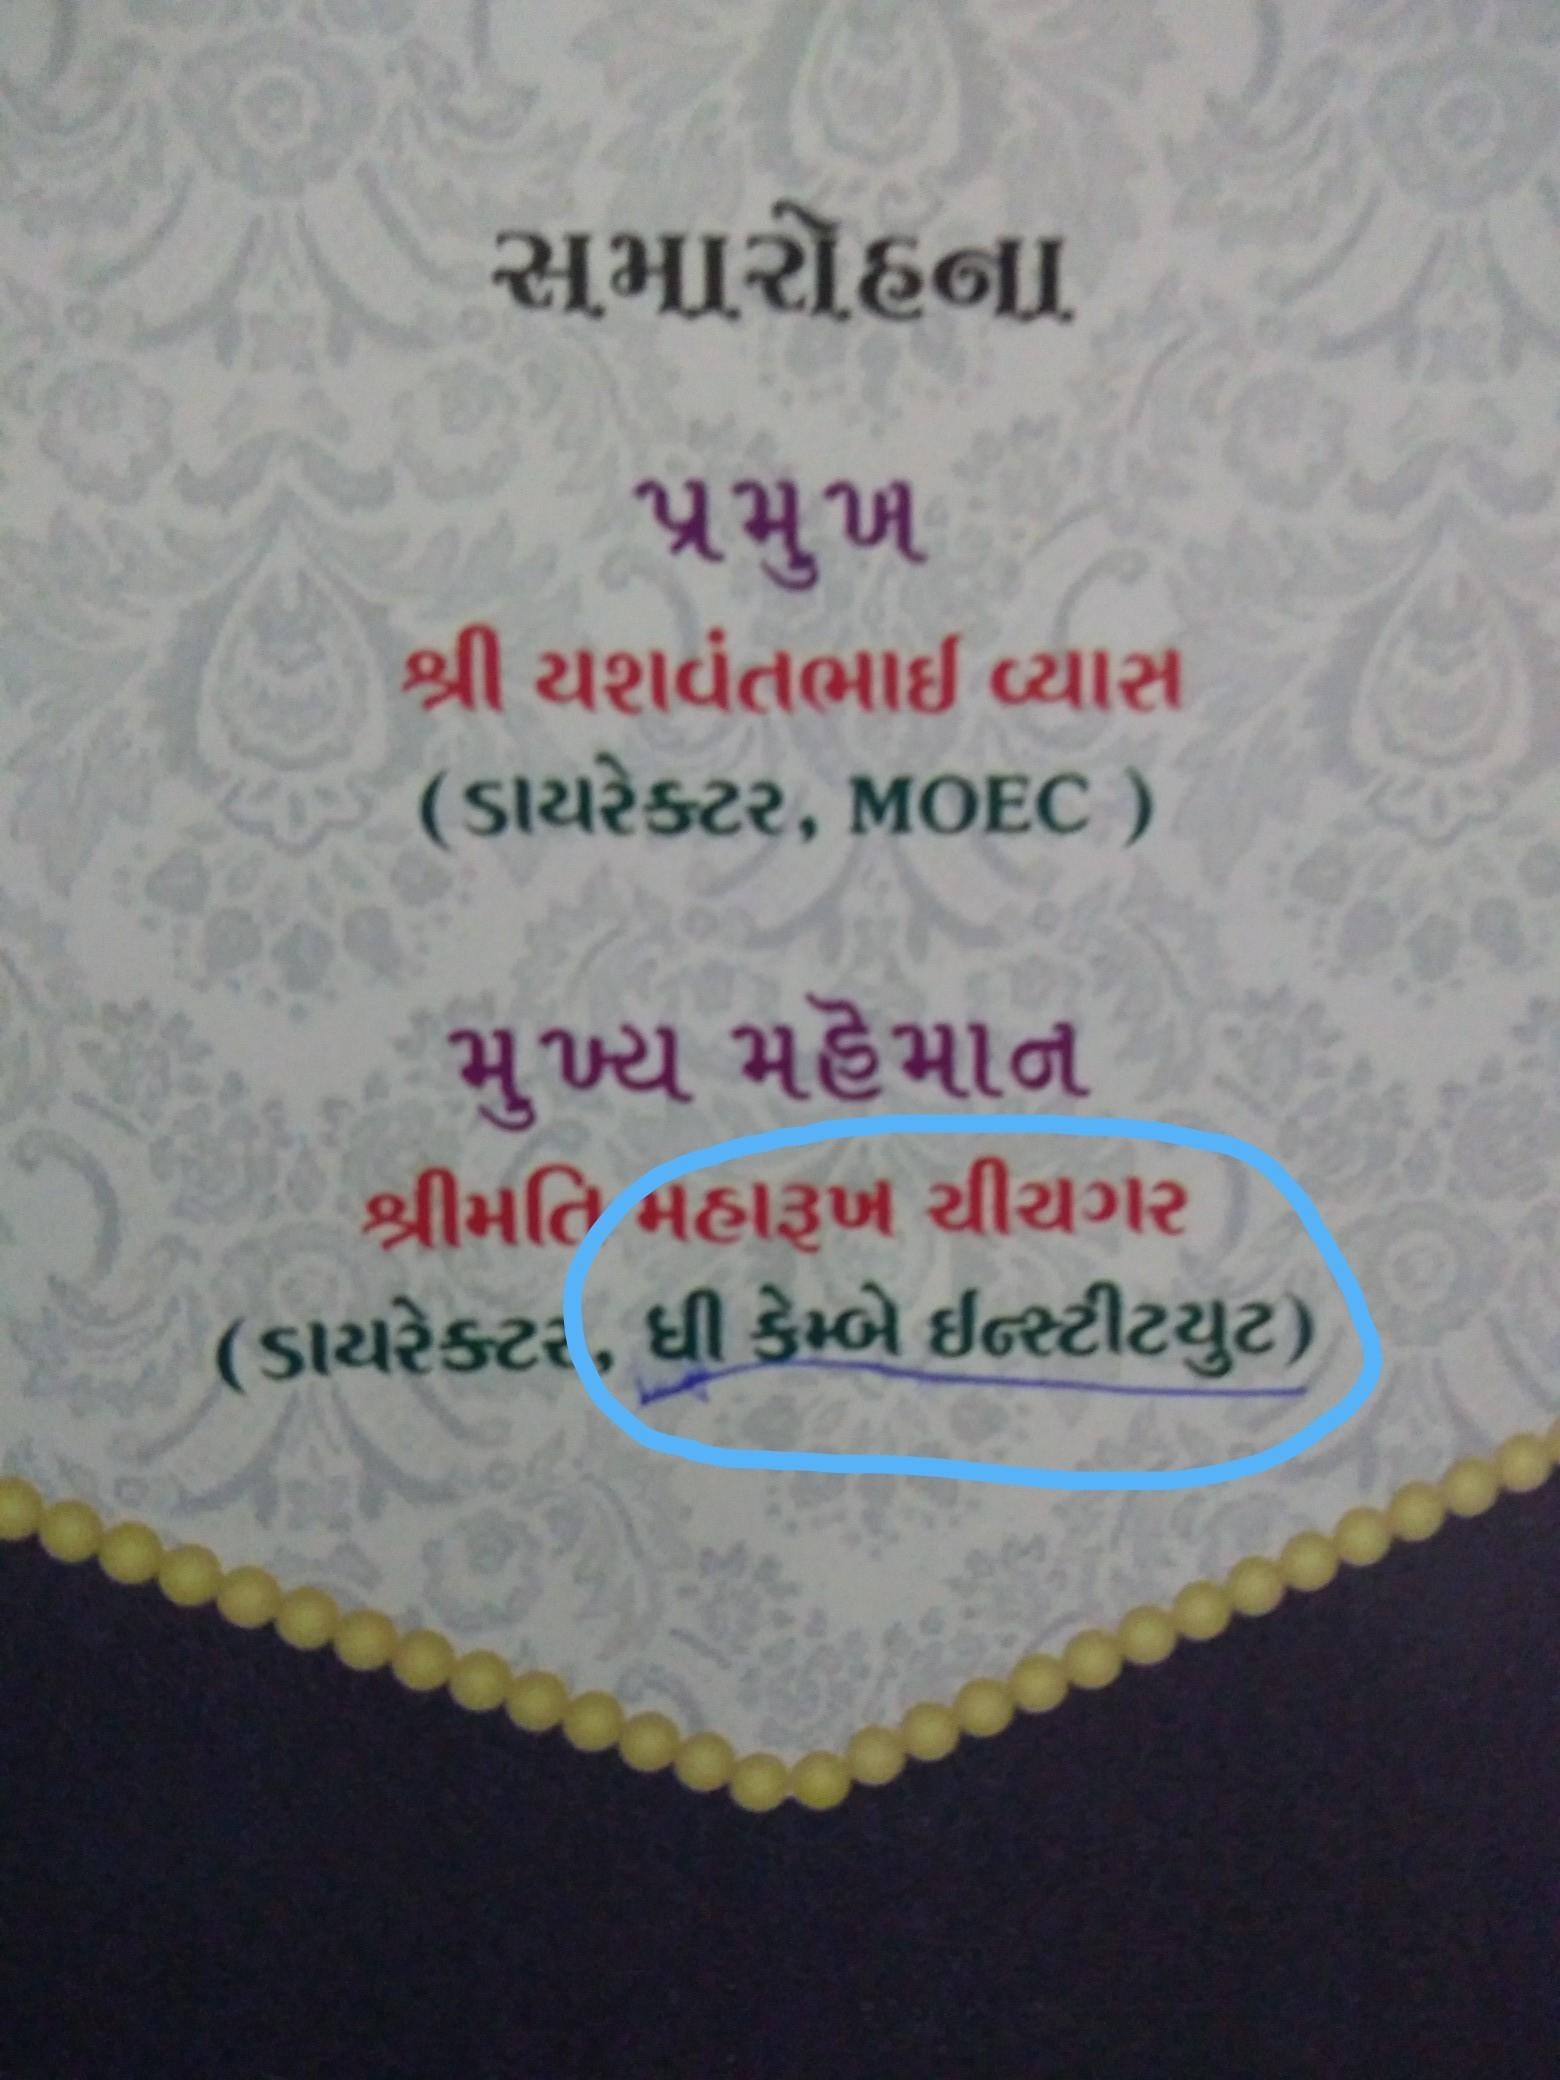 can someone please translate this Gujarati word to English